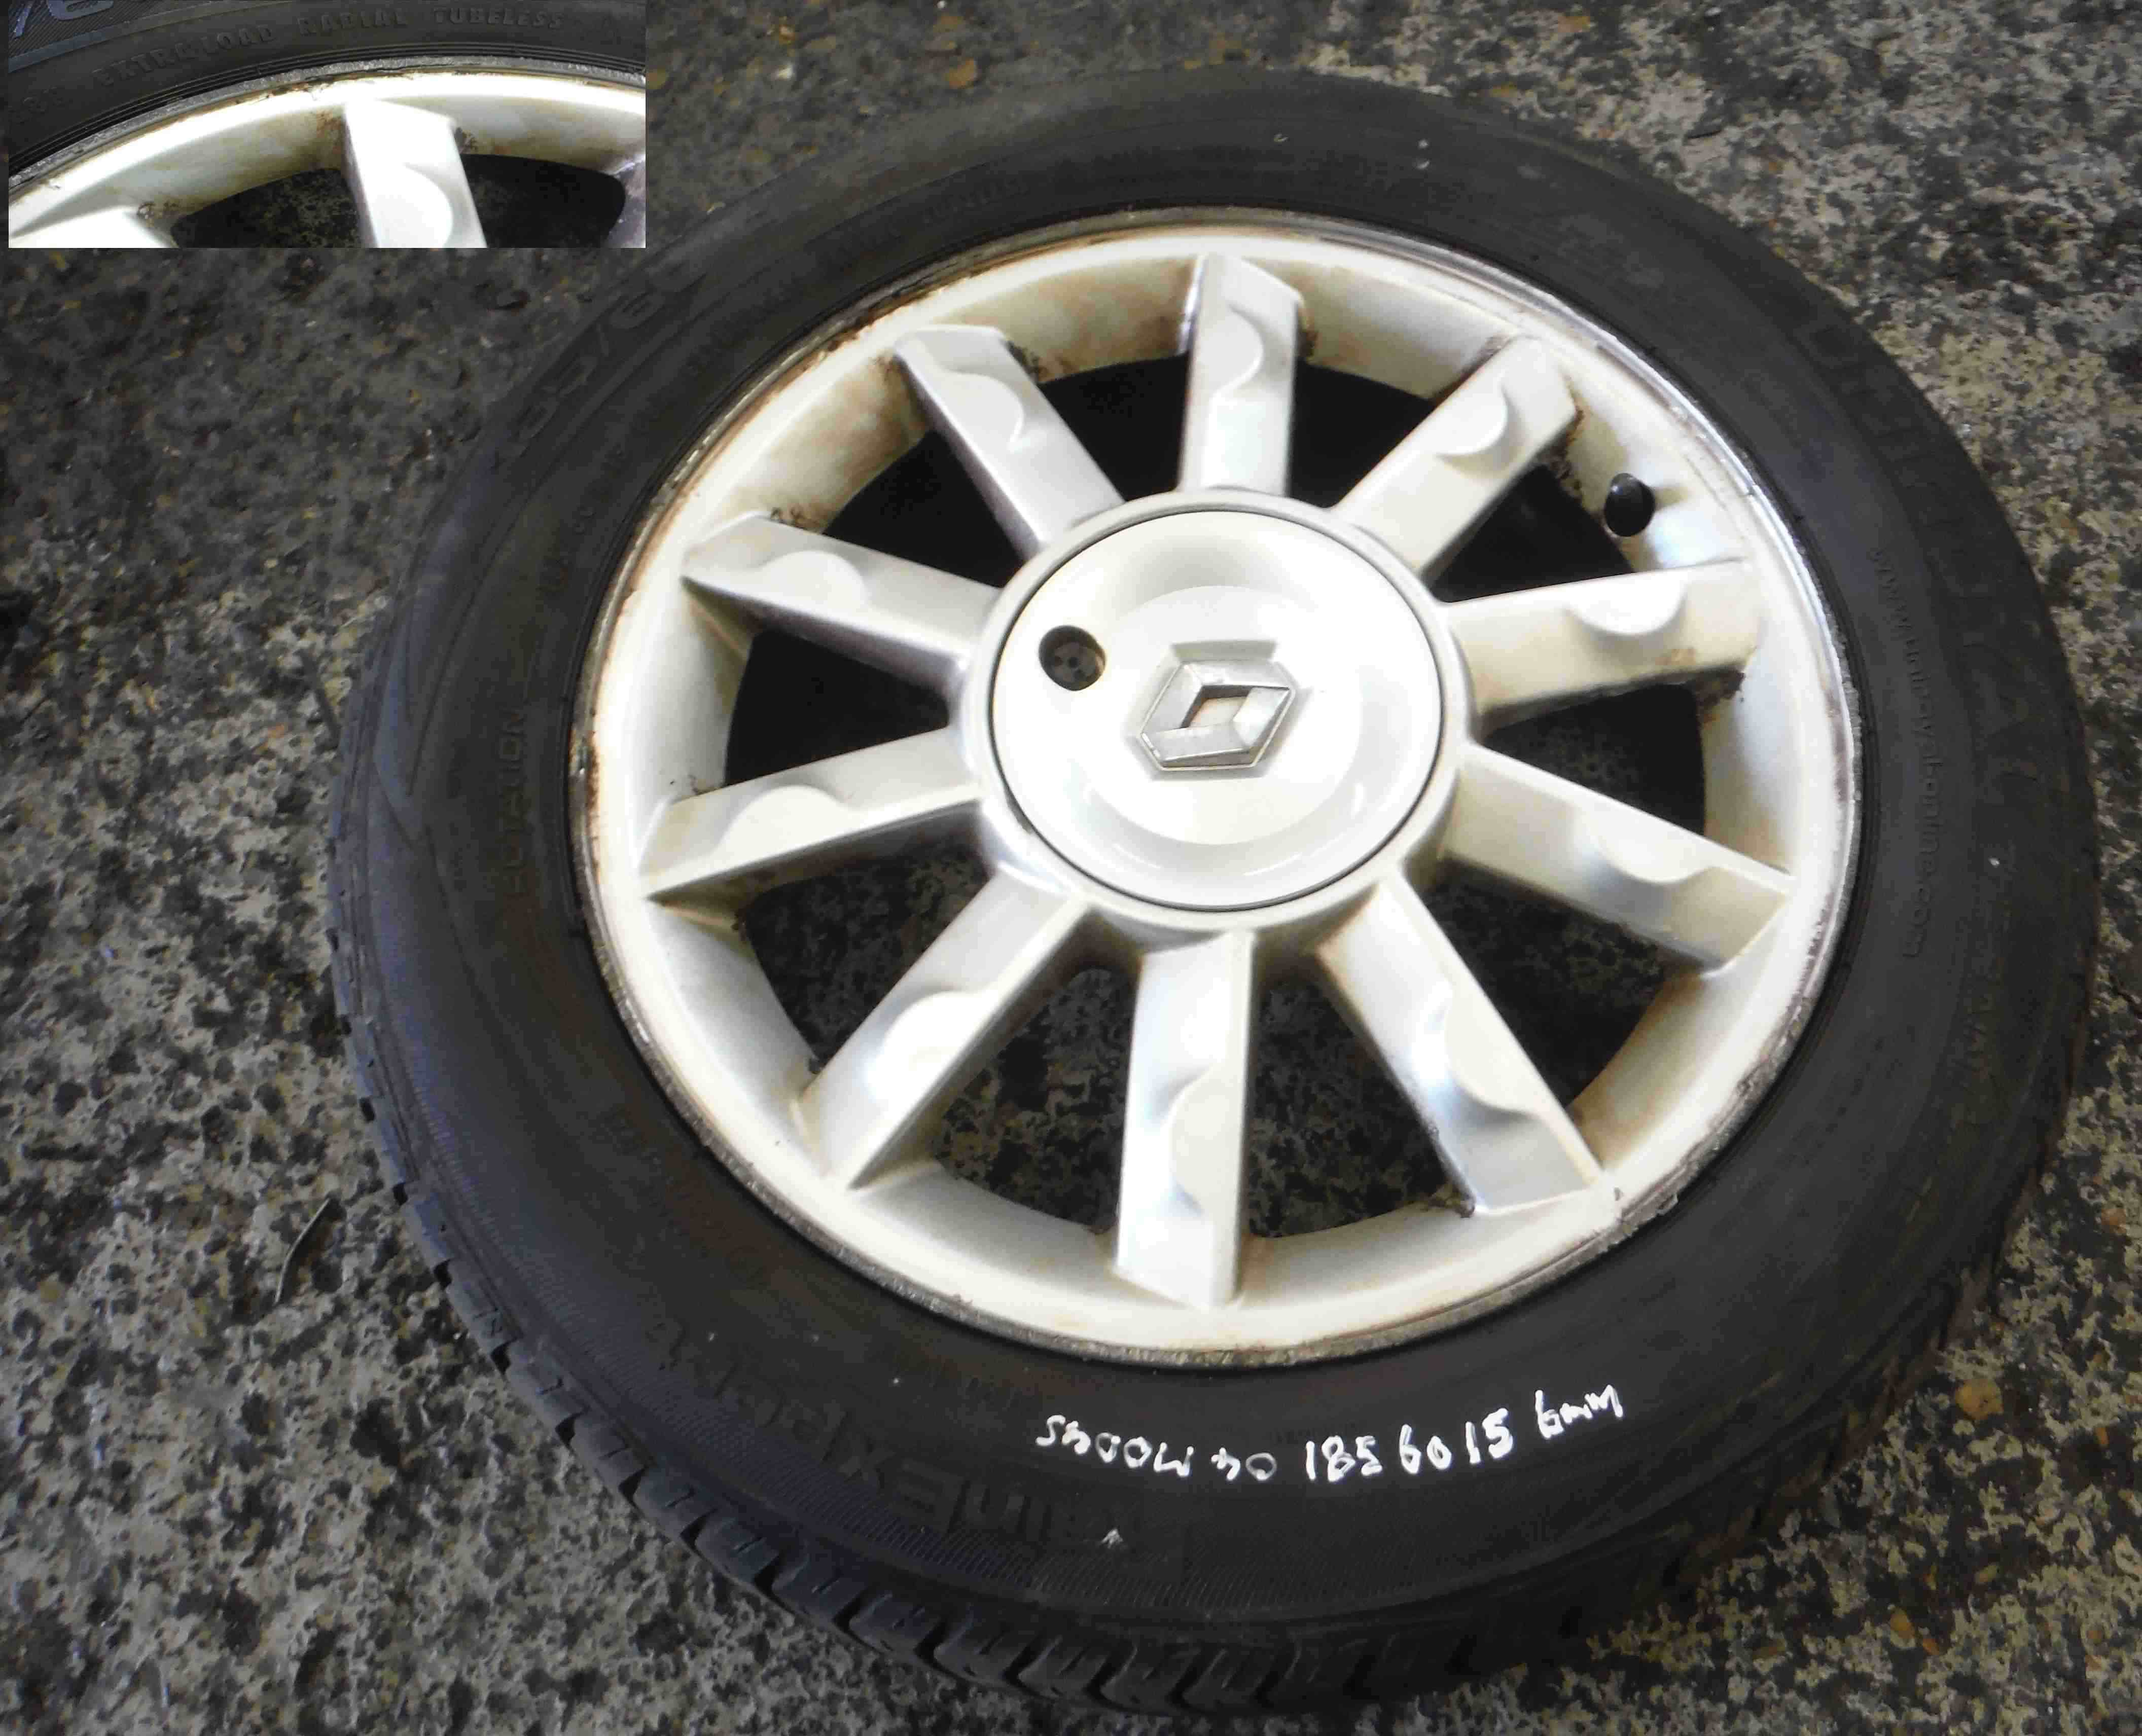 Renault Modus 2004-2008 Alloy Wheel Kimono 15inch Tyre + 185 60 15 6mm Tread 4/5